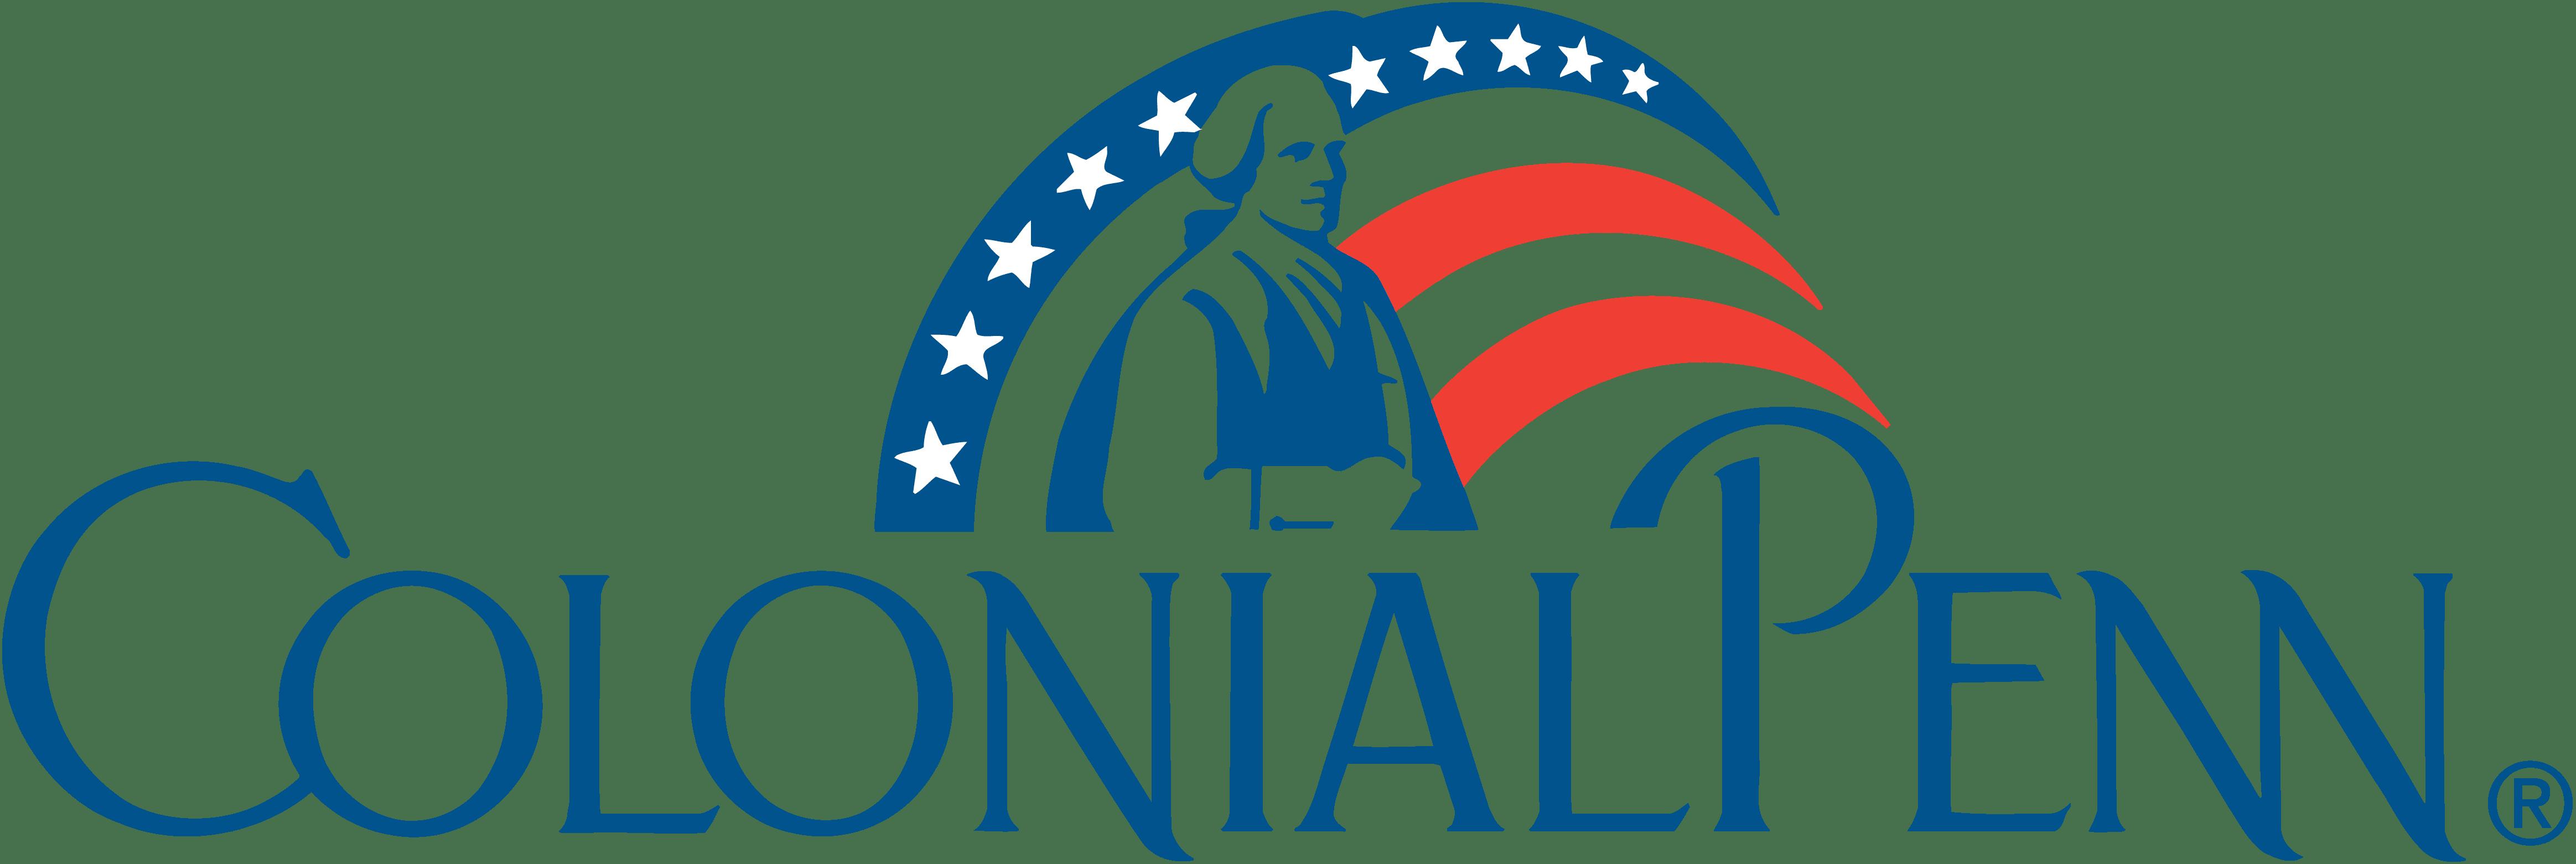 colonial penn logo